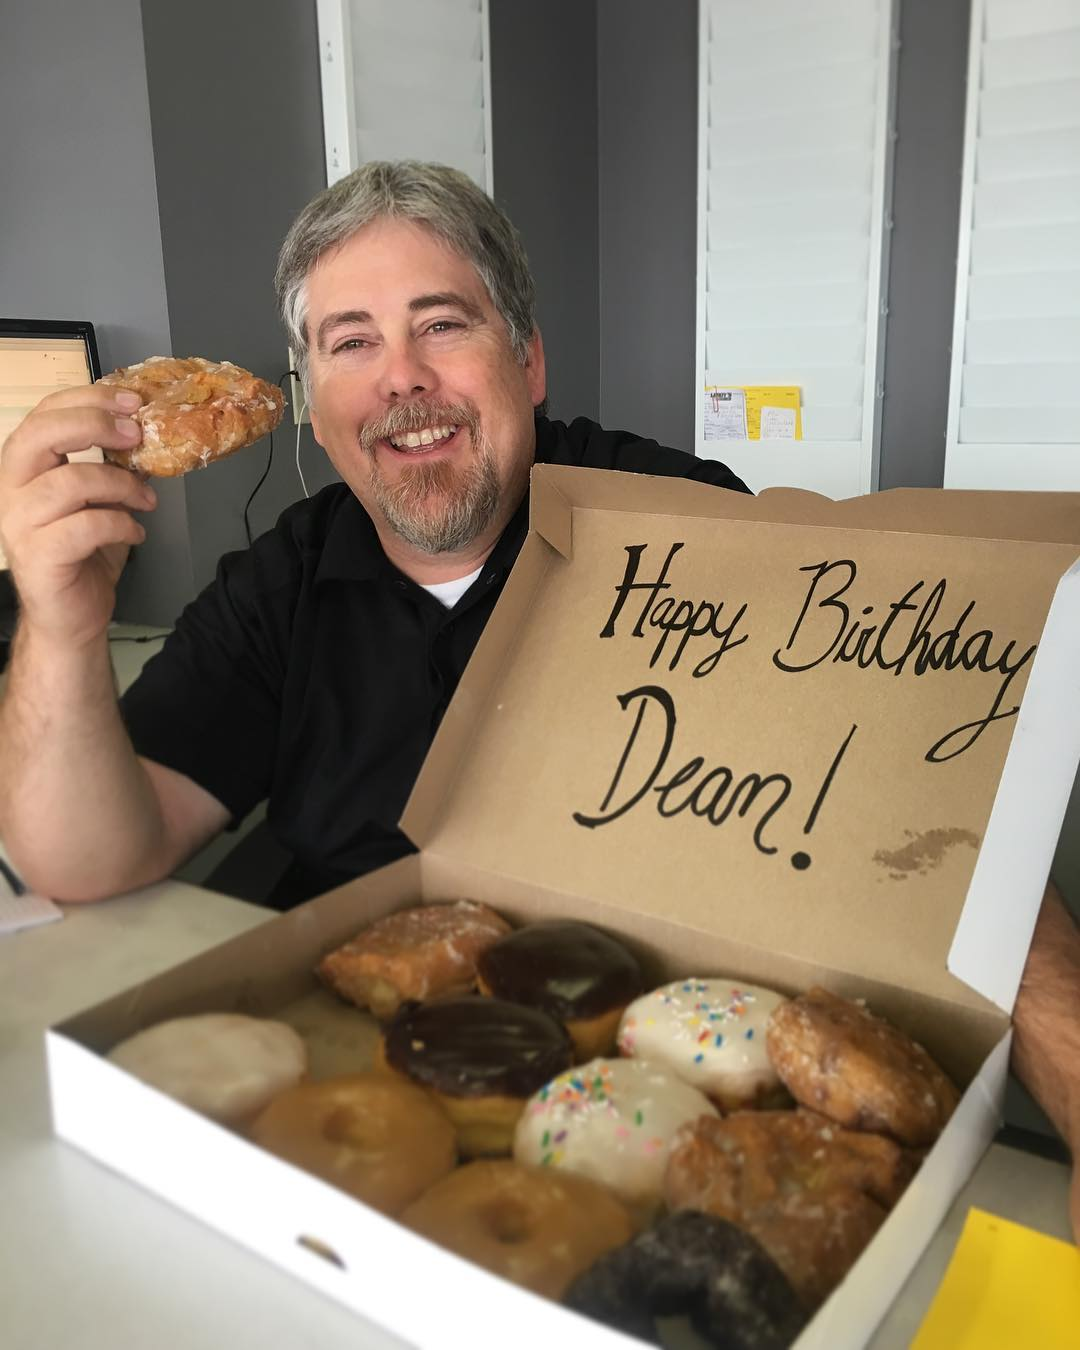 Dean's Birthday.jpg